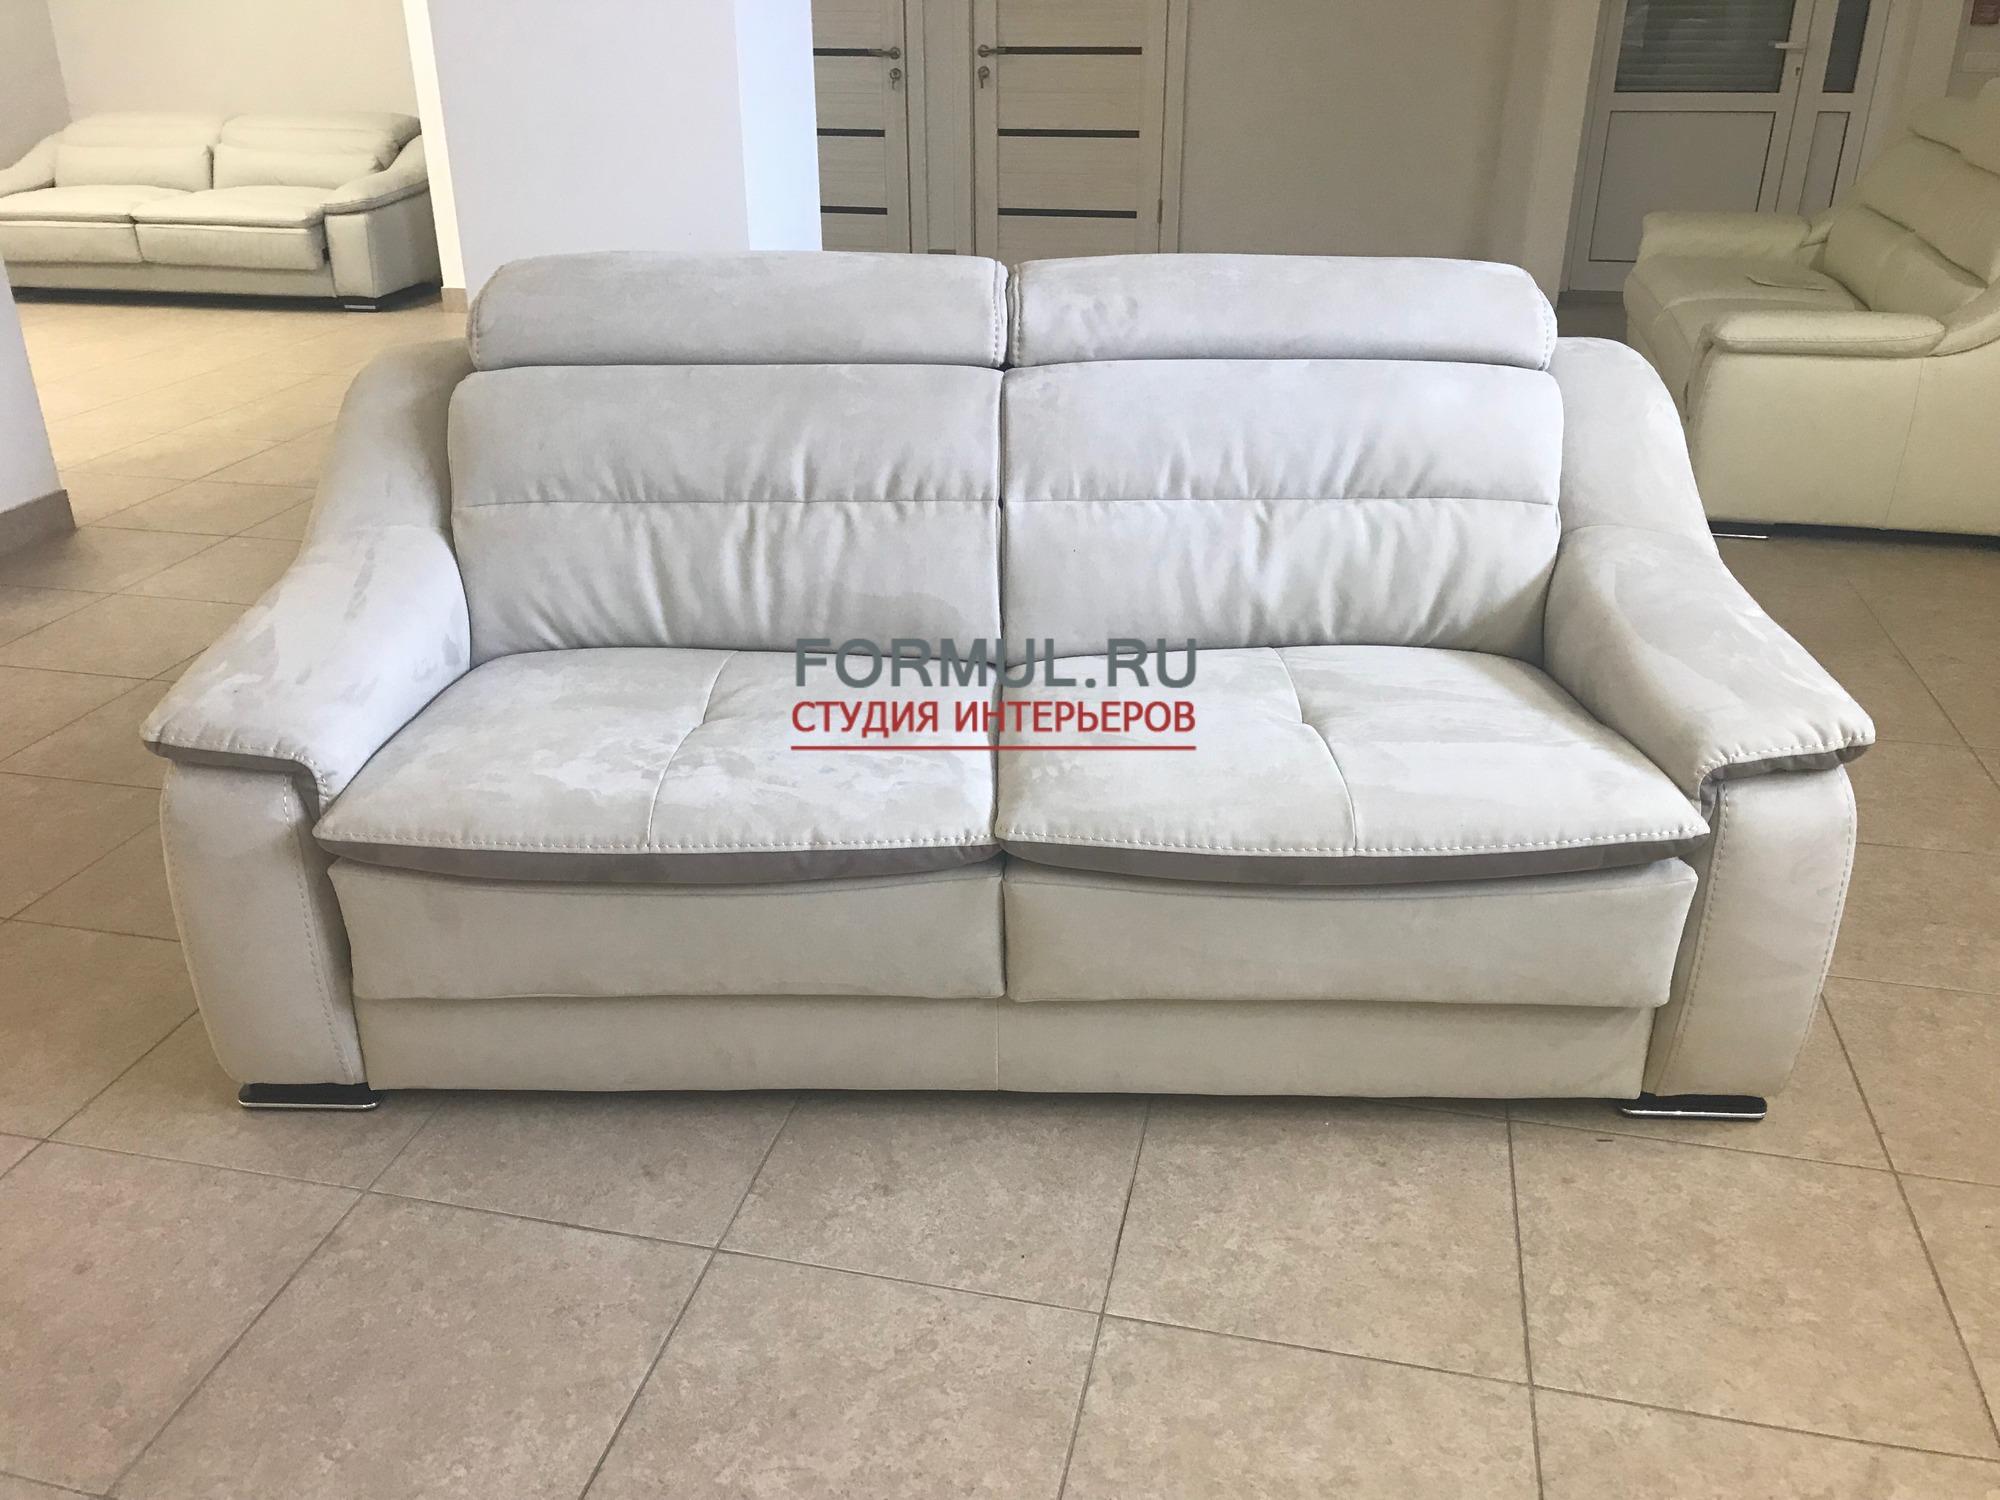 Nieri Sofa Beautiful Sofa Round Leather U Espace U Nieri With Sofa